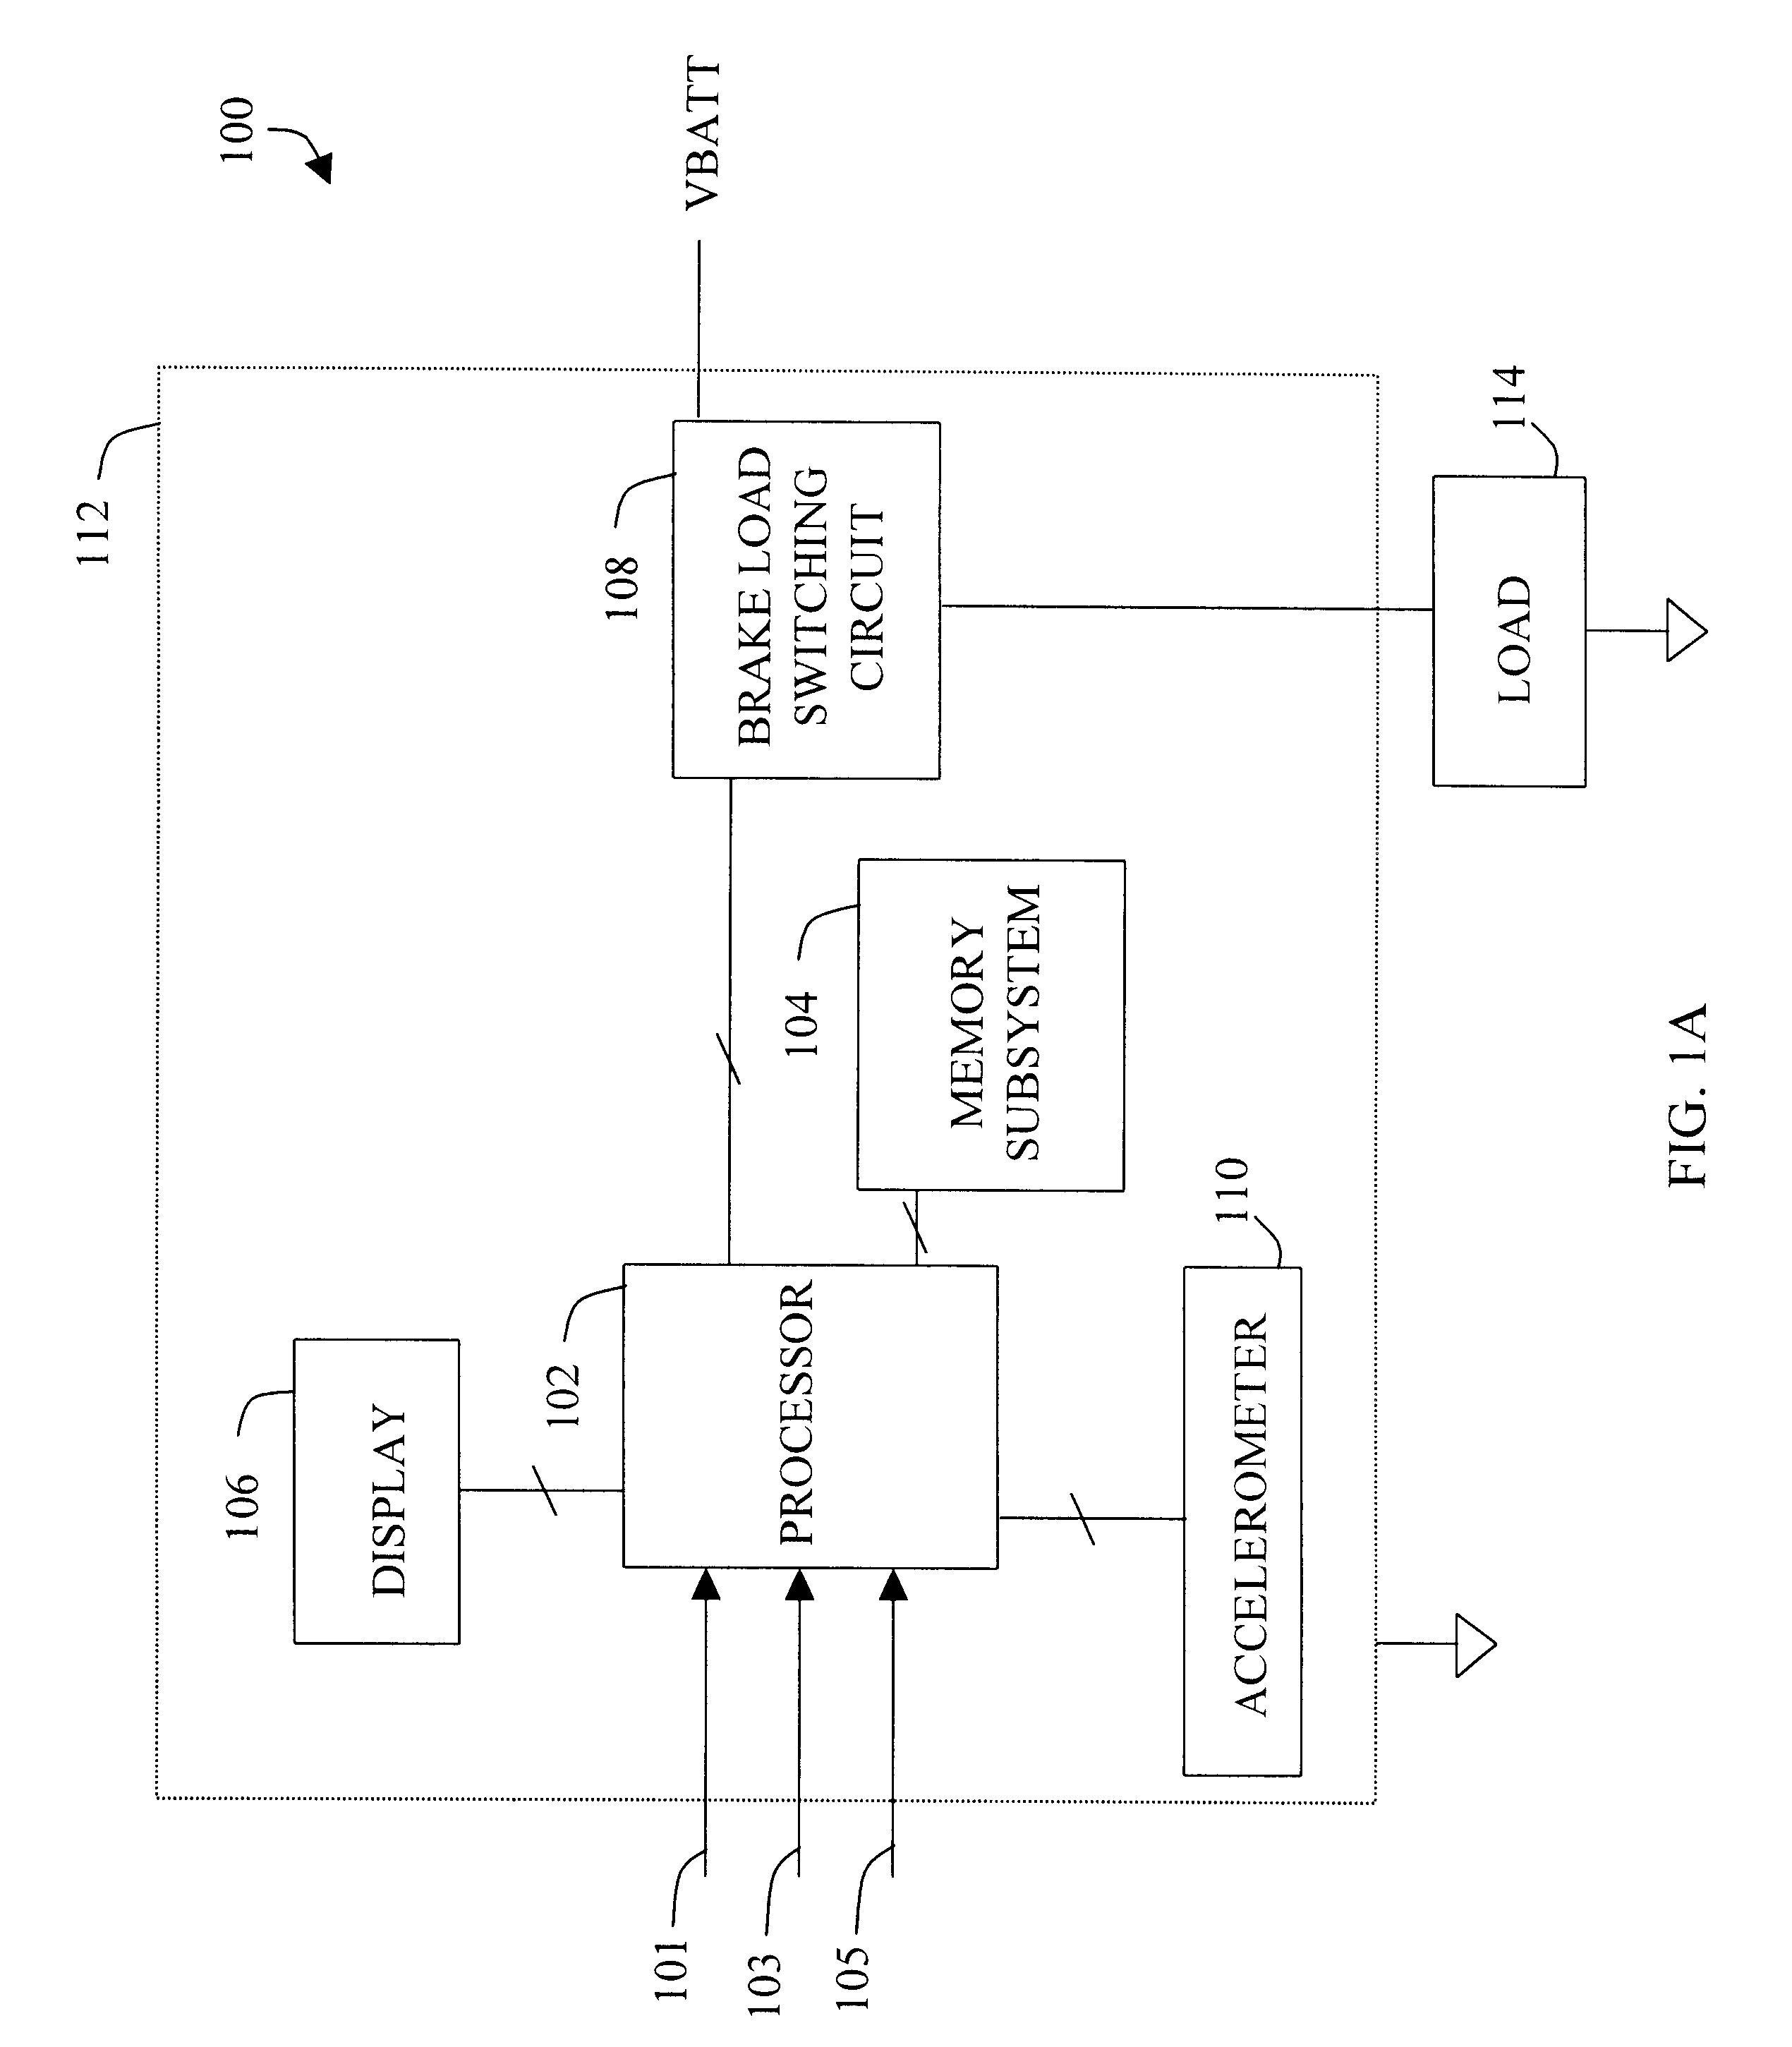 hayman reese trailer ke controller wiring diagram hayman wiring diagram